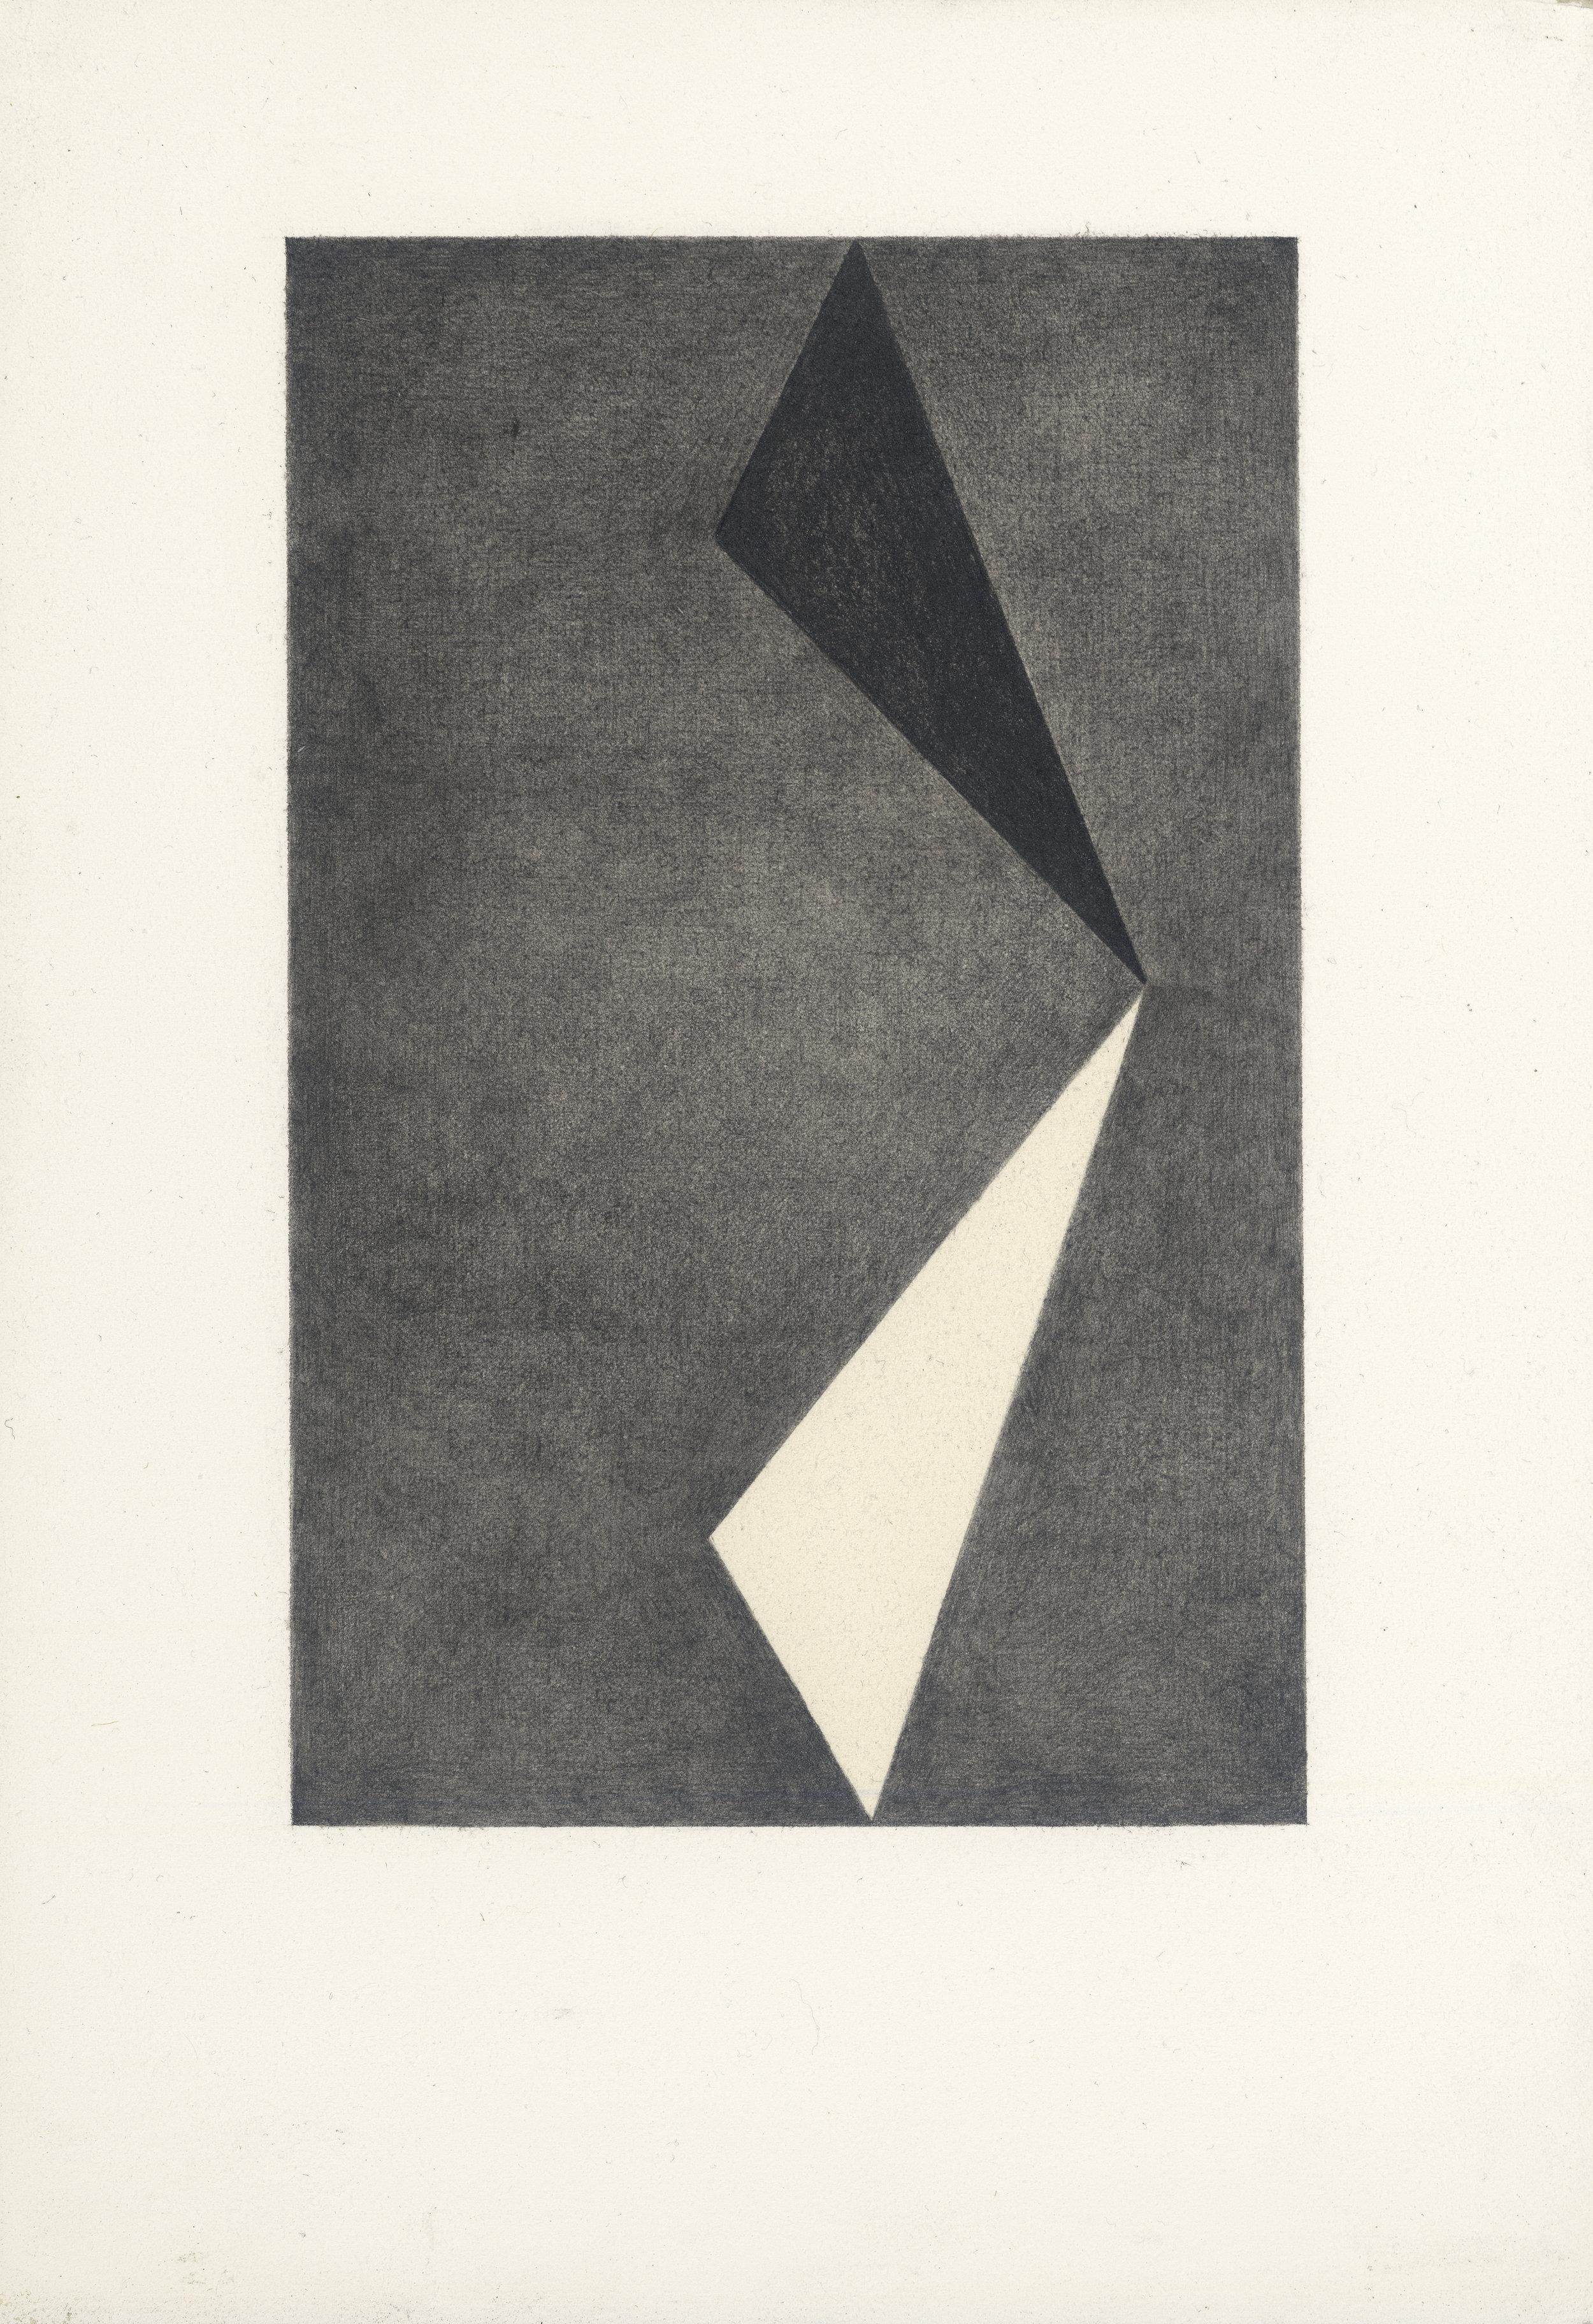 Black Geometry, Symmetry 2 (2016)